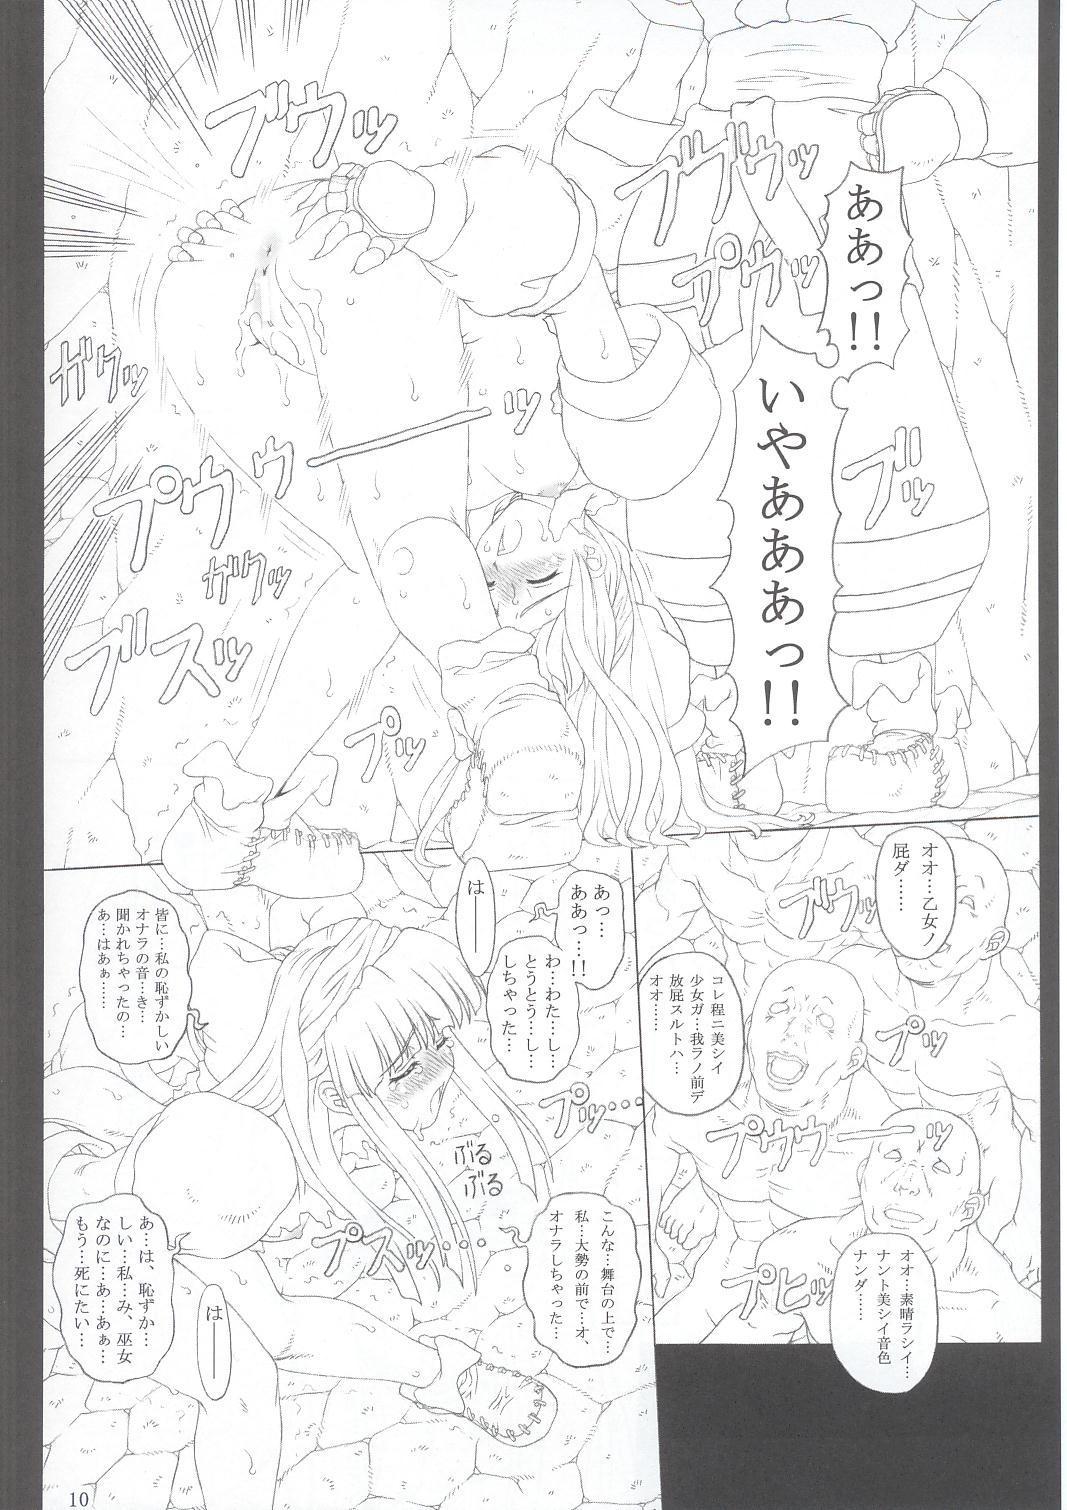 JUNK Dain no Miko San 8